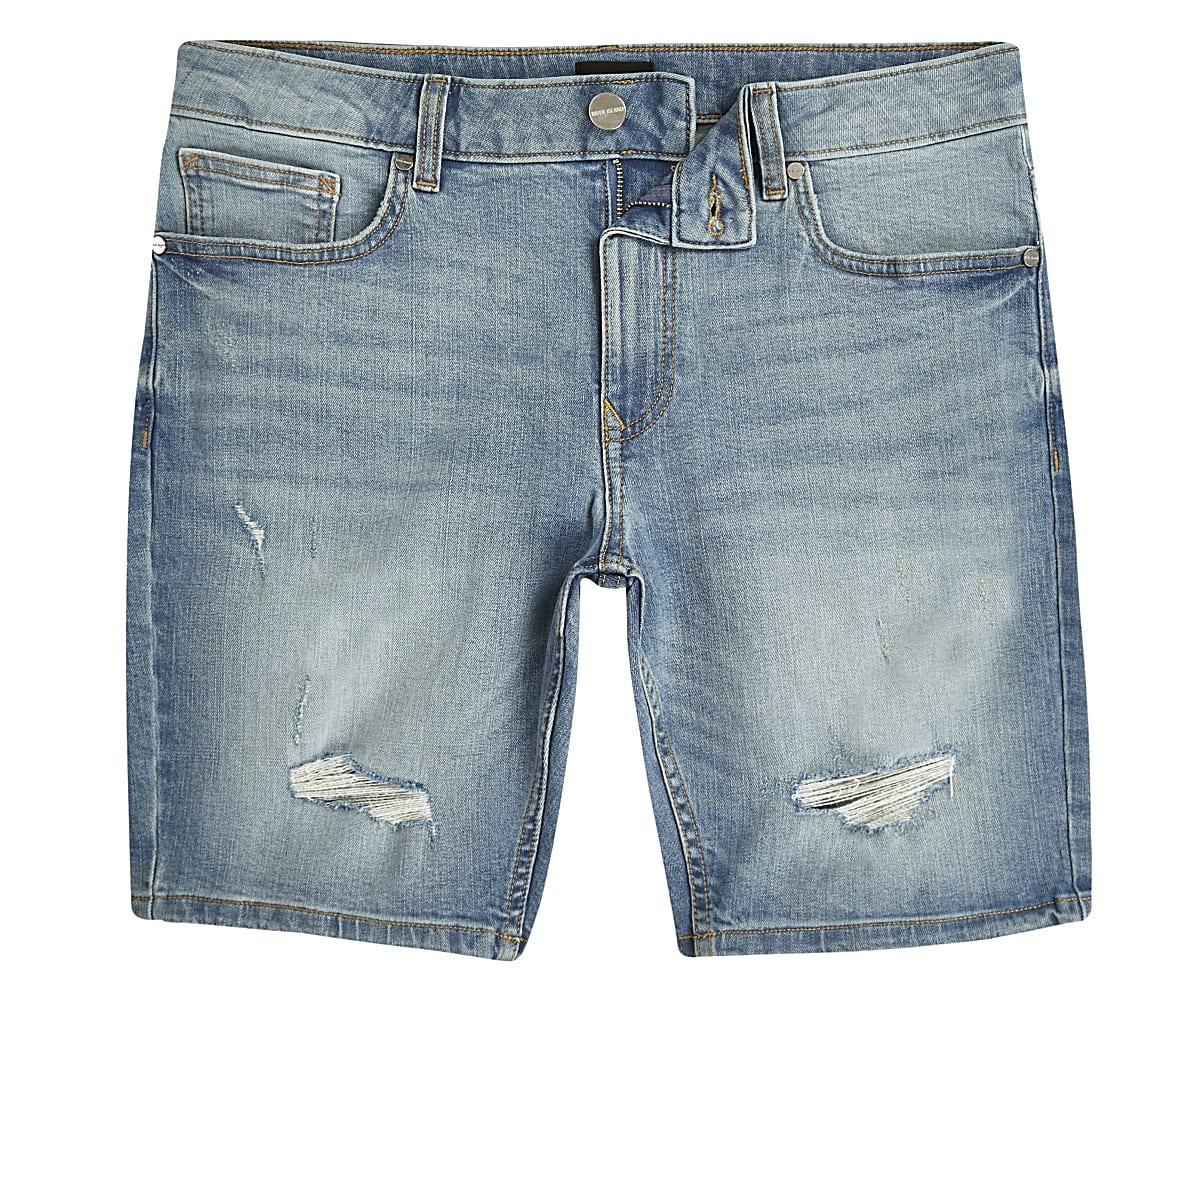 3dc1dbfe03 Light blue Sid skinny ripped denim shorts - Casual Shorts - Shorts - men